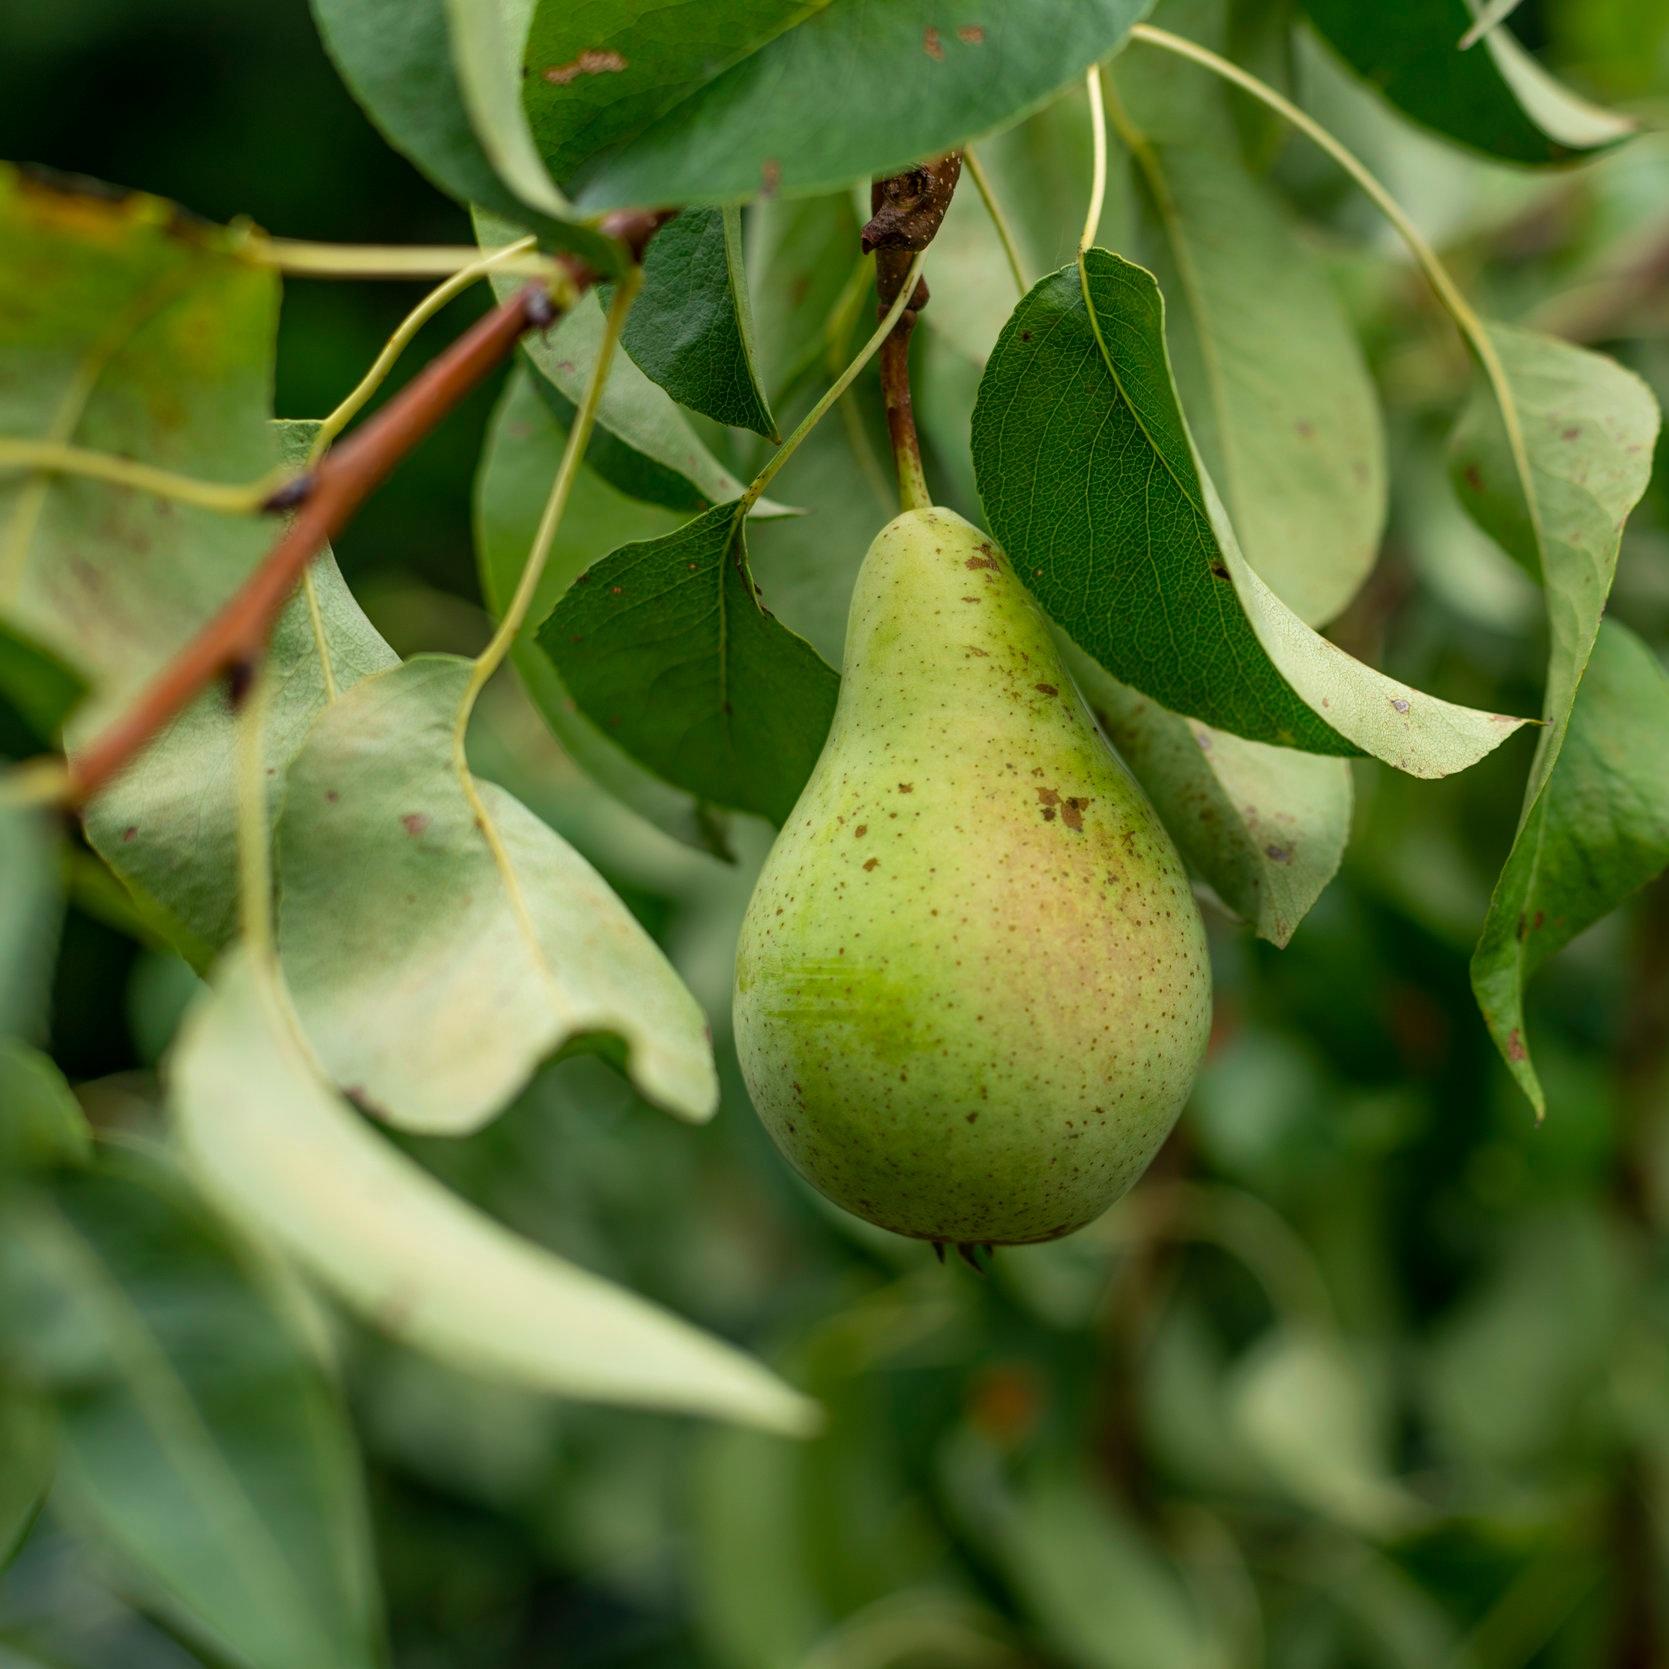 Community Fruit Harvesting Wairarapa